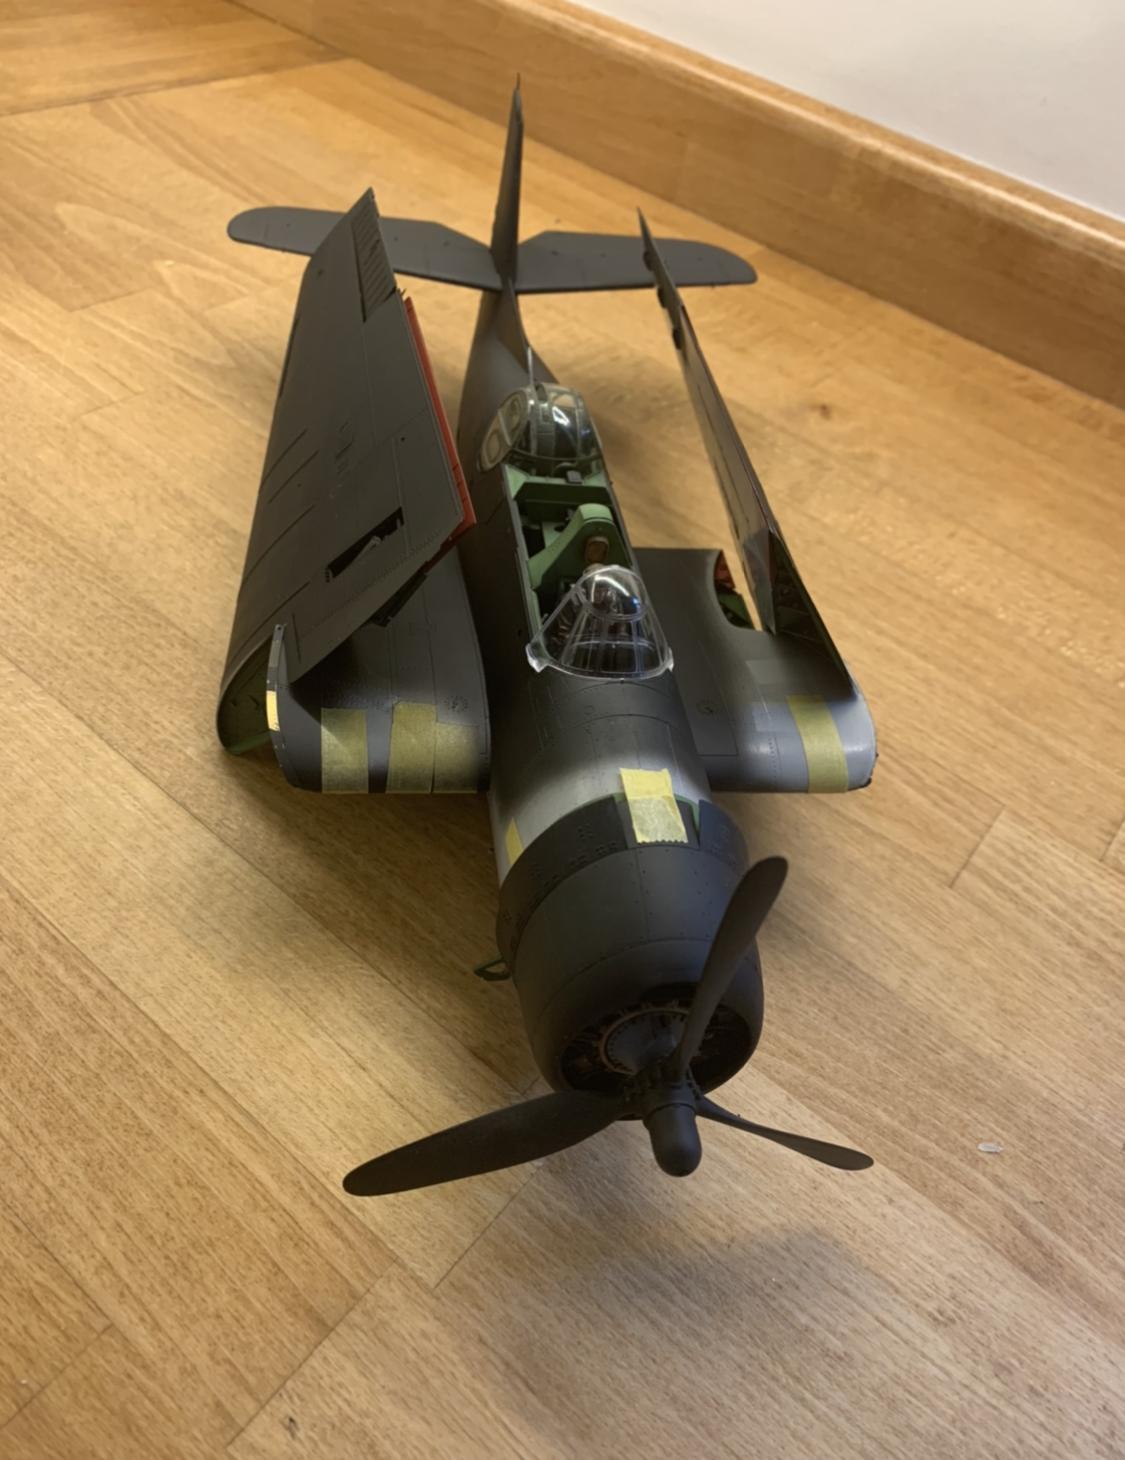 B82ADECA-DE5E-4CB5-B74A-945AFCAF30AC.jpeg